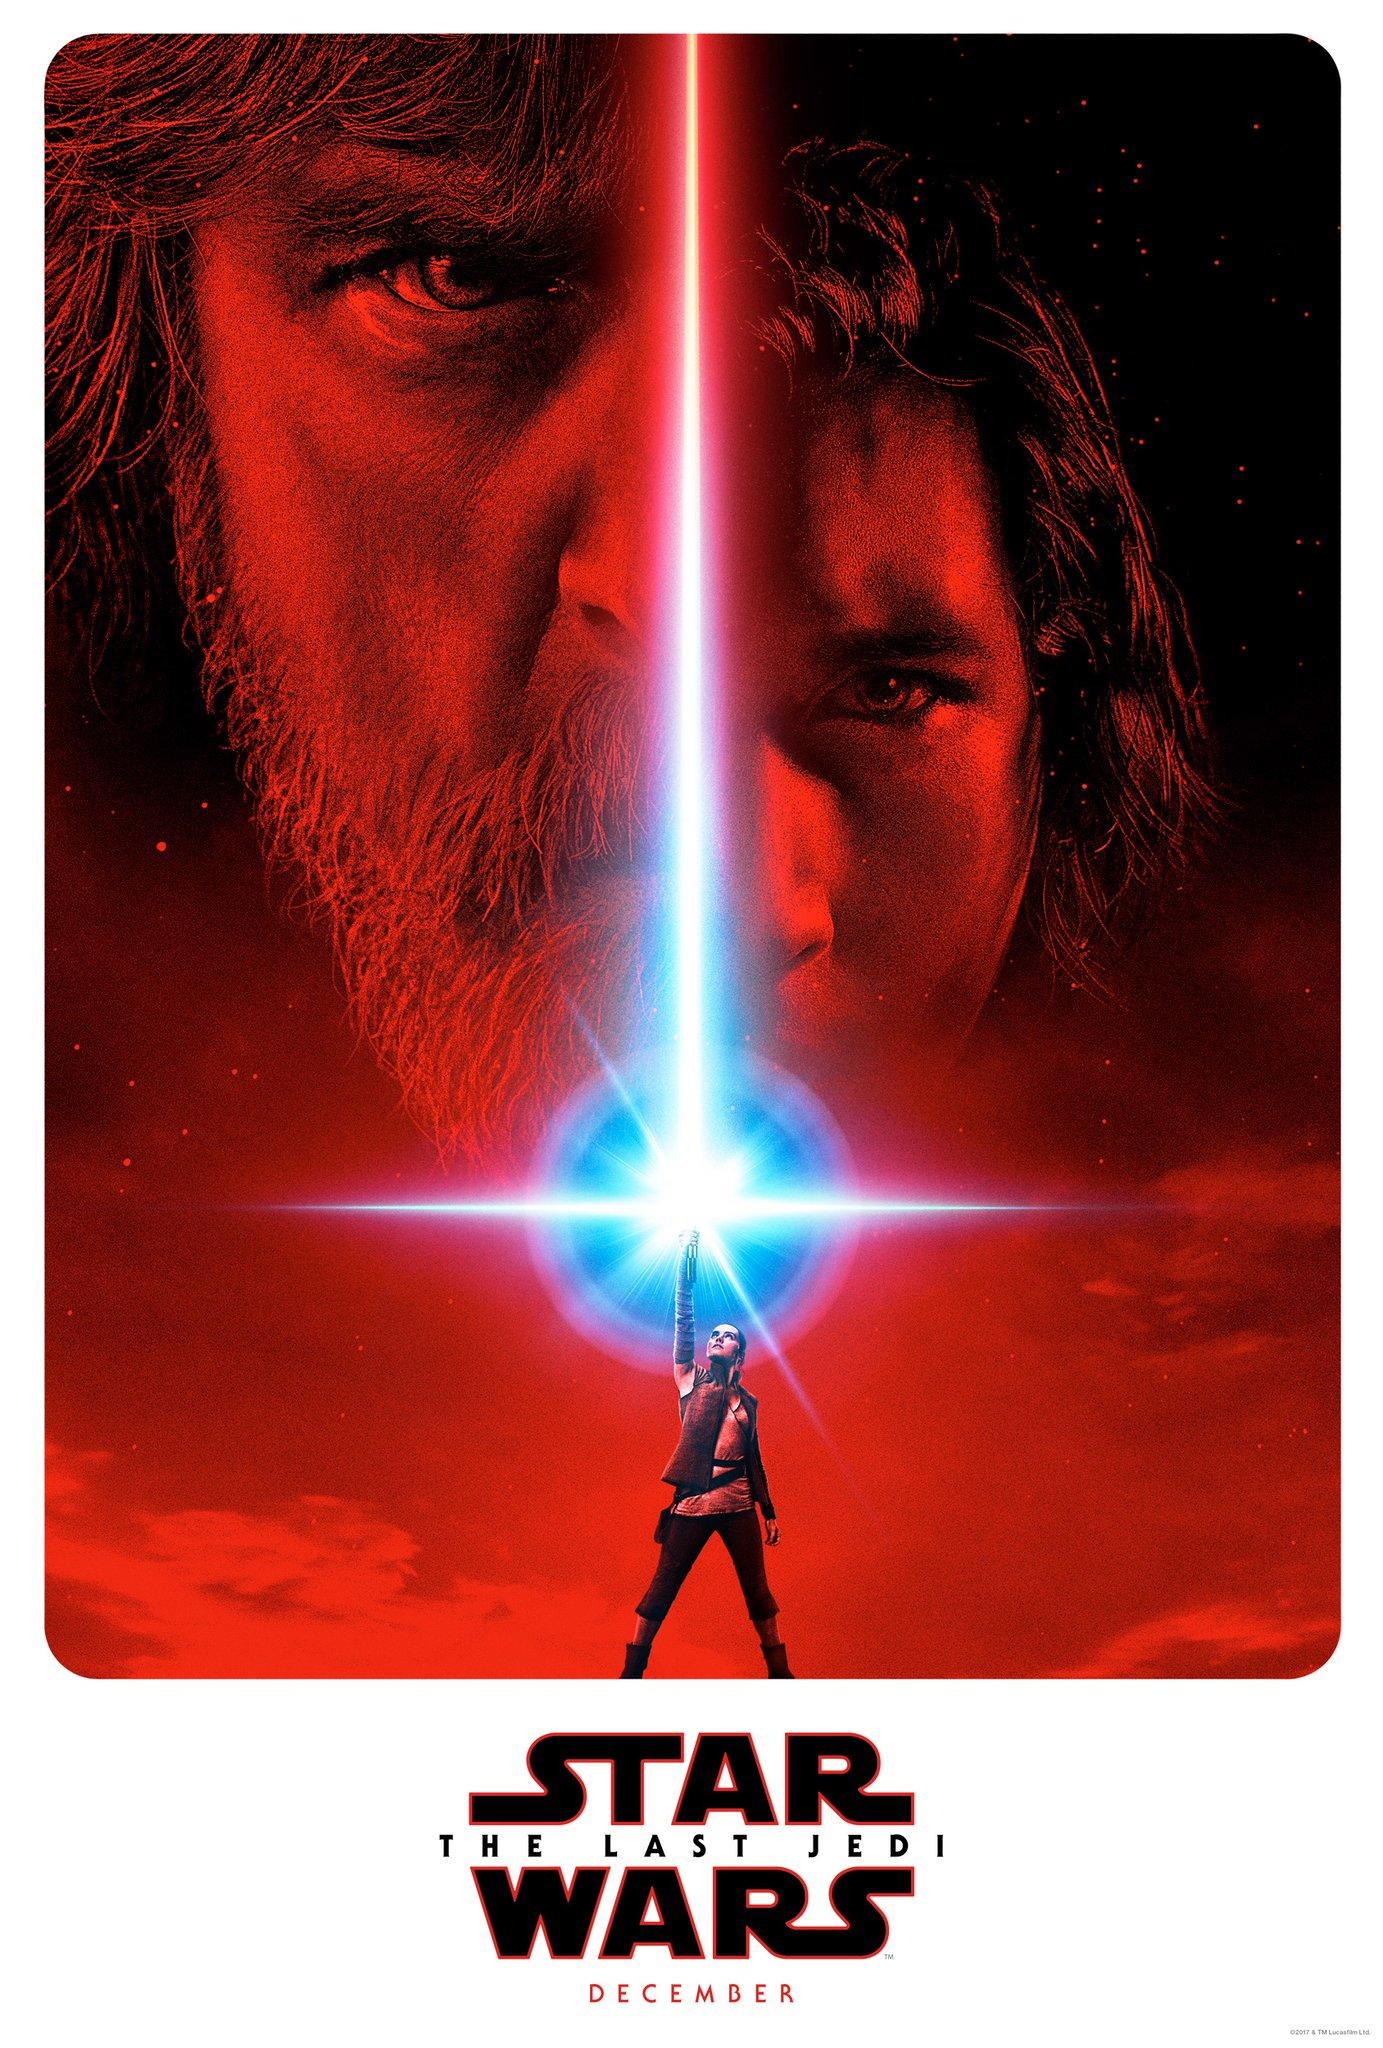 Last Jedi poster